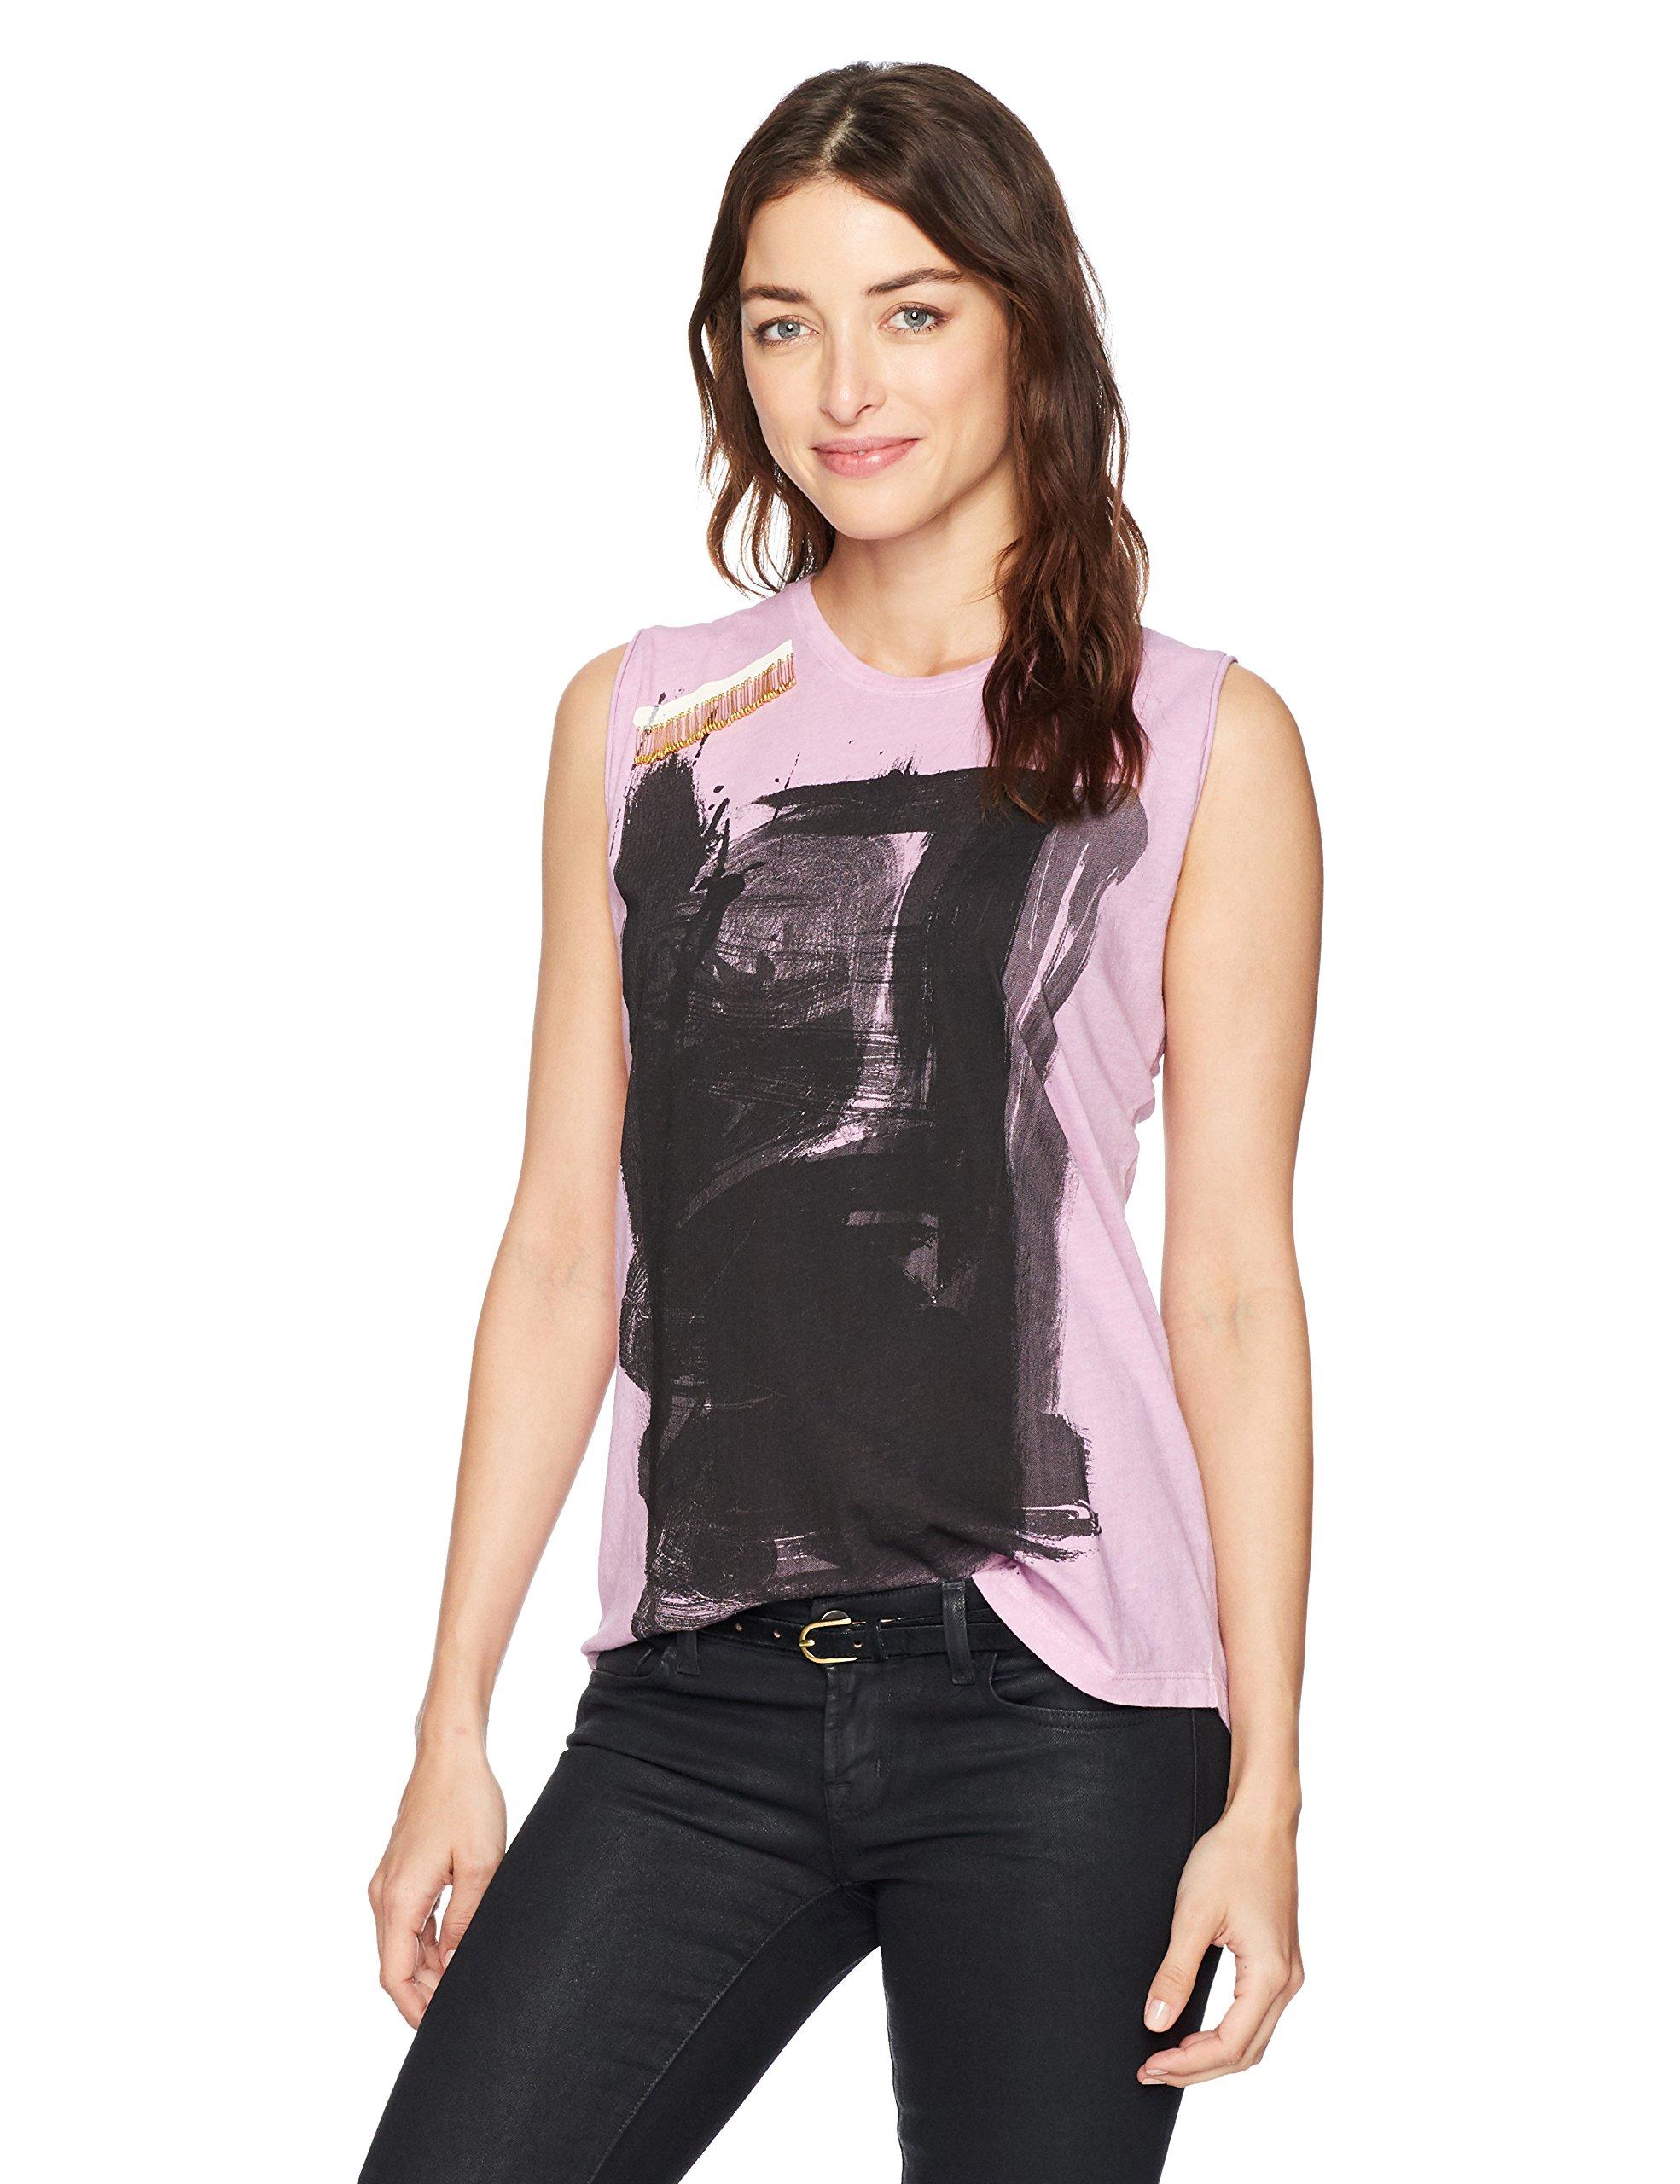 FREECITY Women's Paintbox Sleeveless T-Shirt W/Pins, Magical Love, M